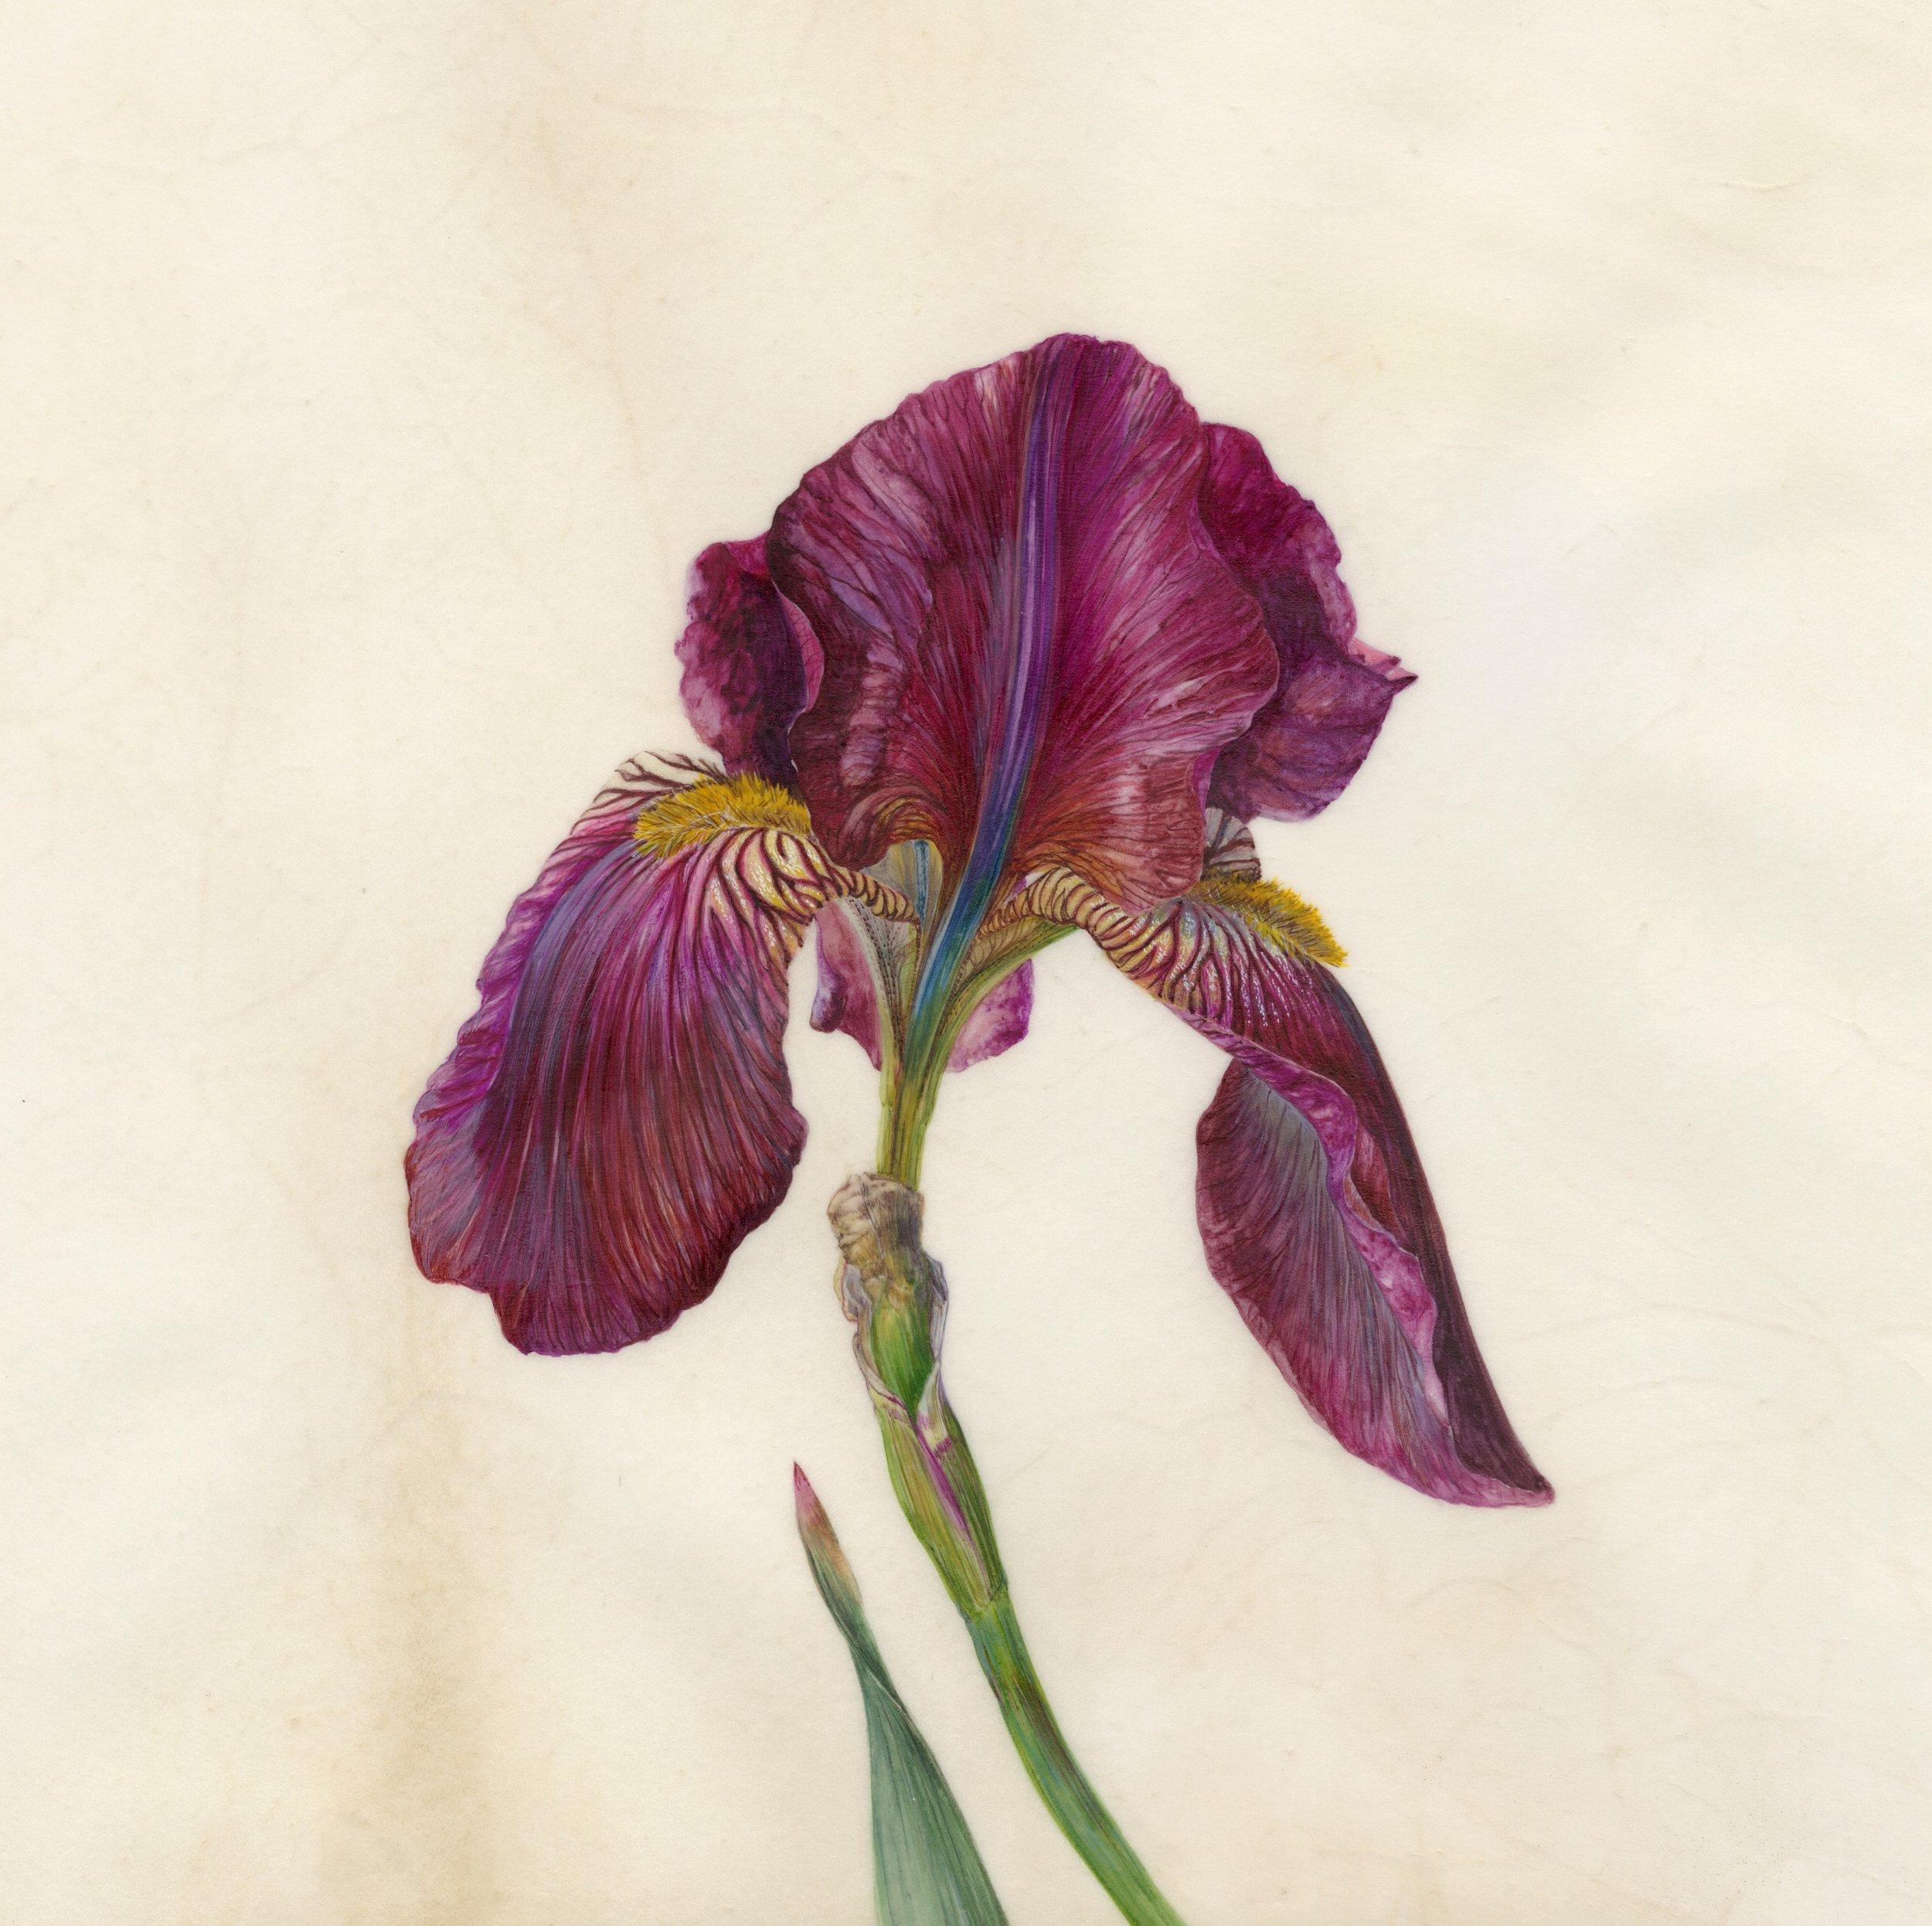 Iris Recognition V Red Orchid  watercolour on natural calfskin vellum  frame 45cm x 45cm  image 21.5cm x 21.5cm  £720 framed